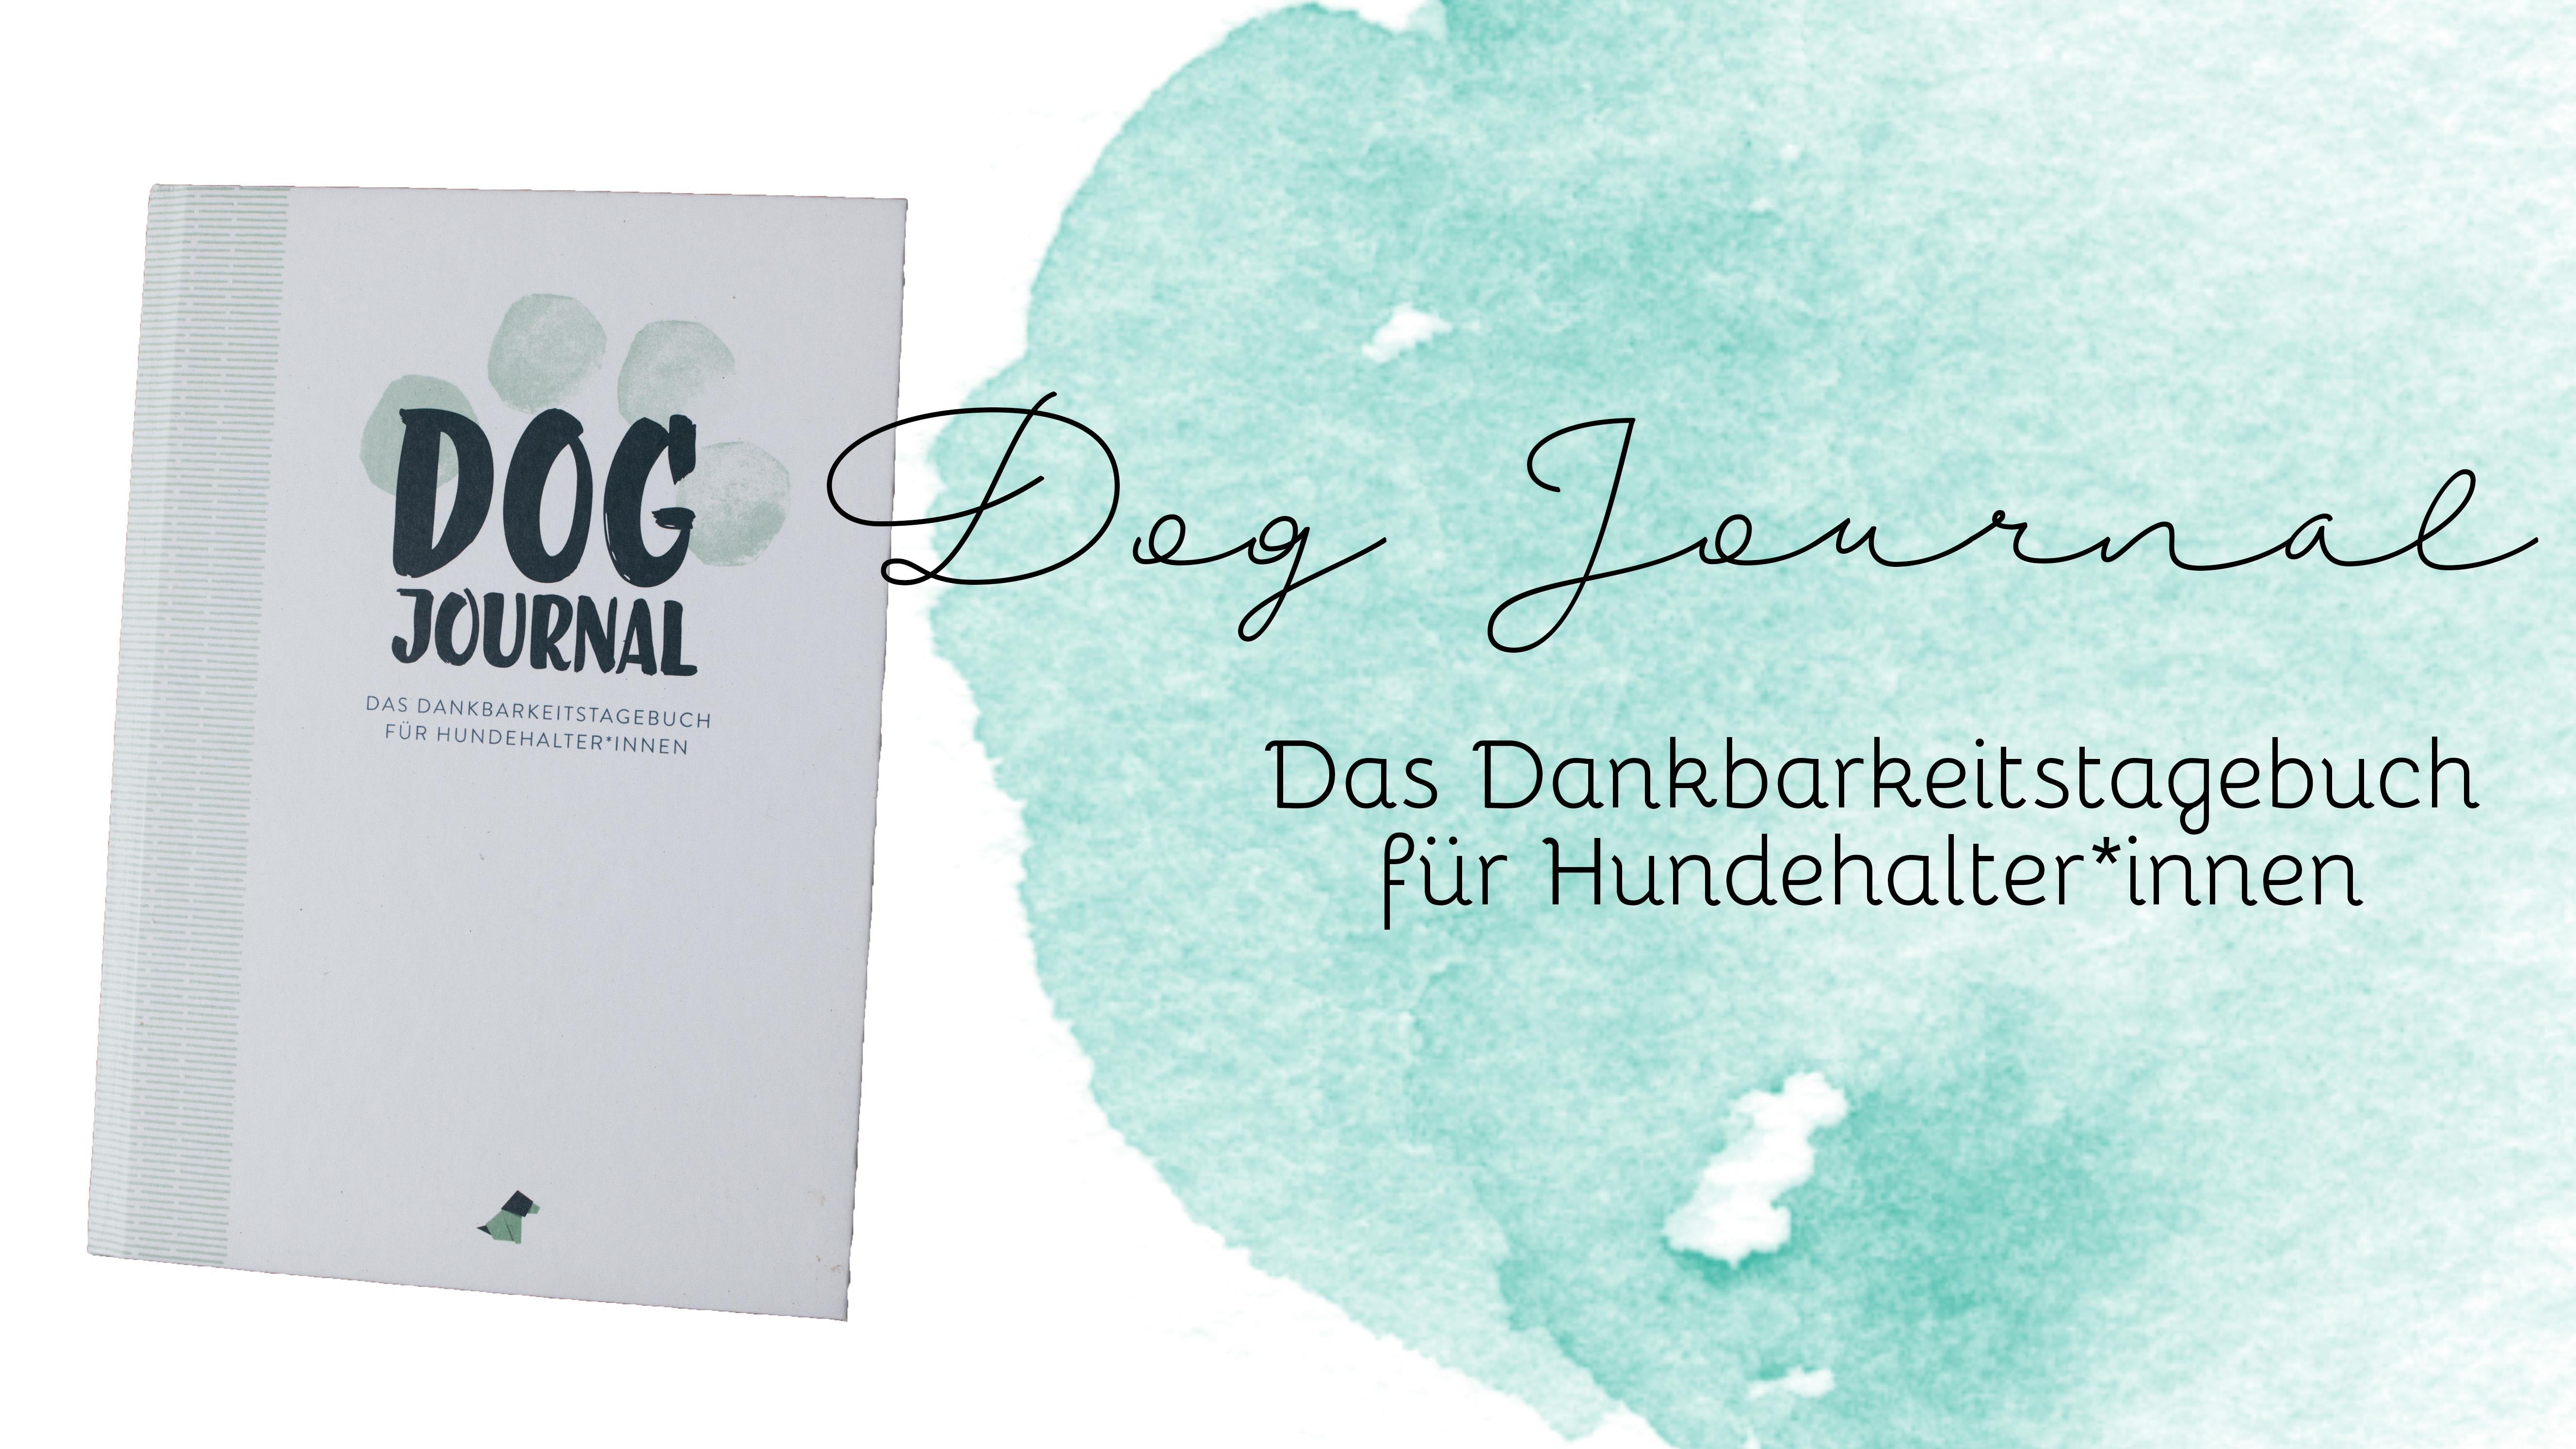 Dog Journal Dankbarkeitstagebuch Hundehalter Dogblog Hundeblog Canistecture